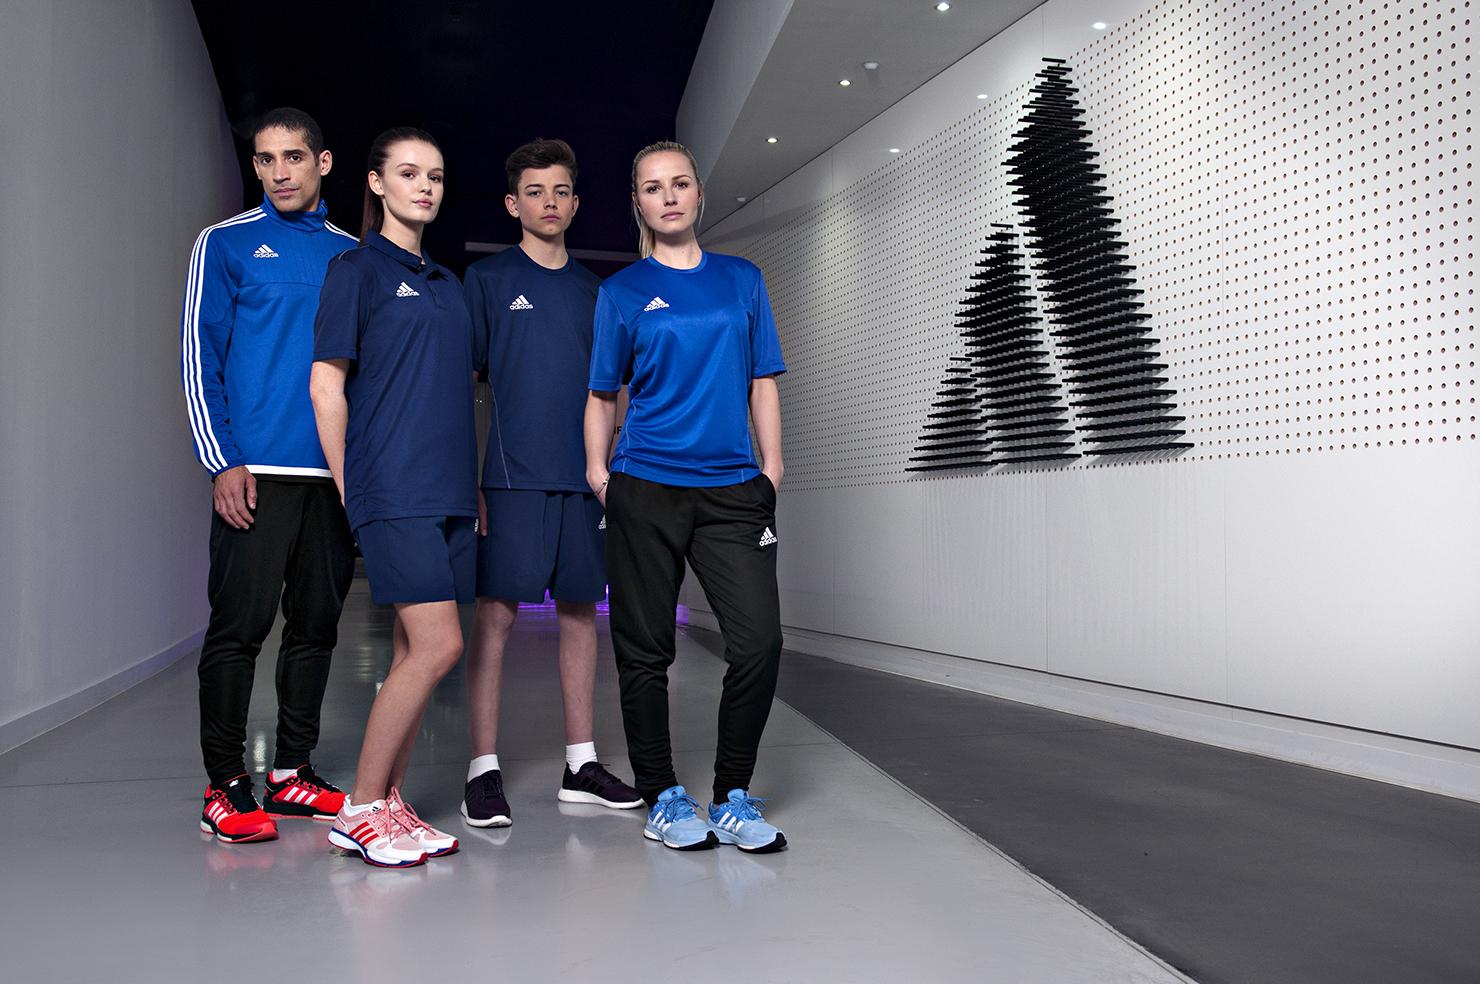 SWI adidas Teamwear1537_RT.jpg